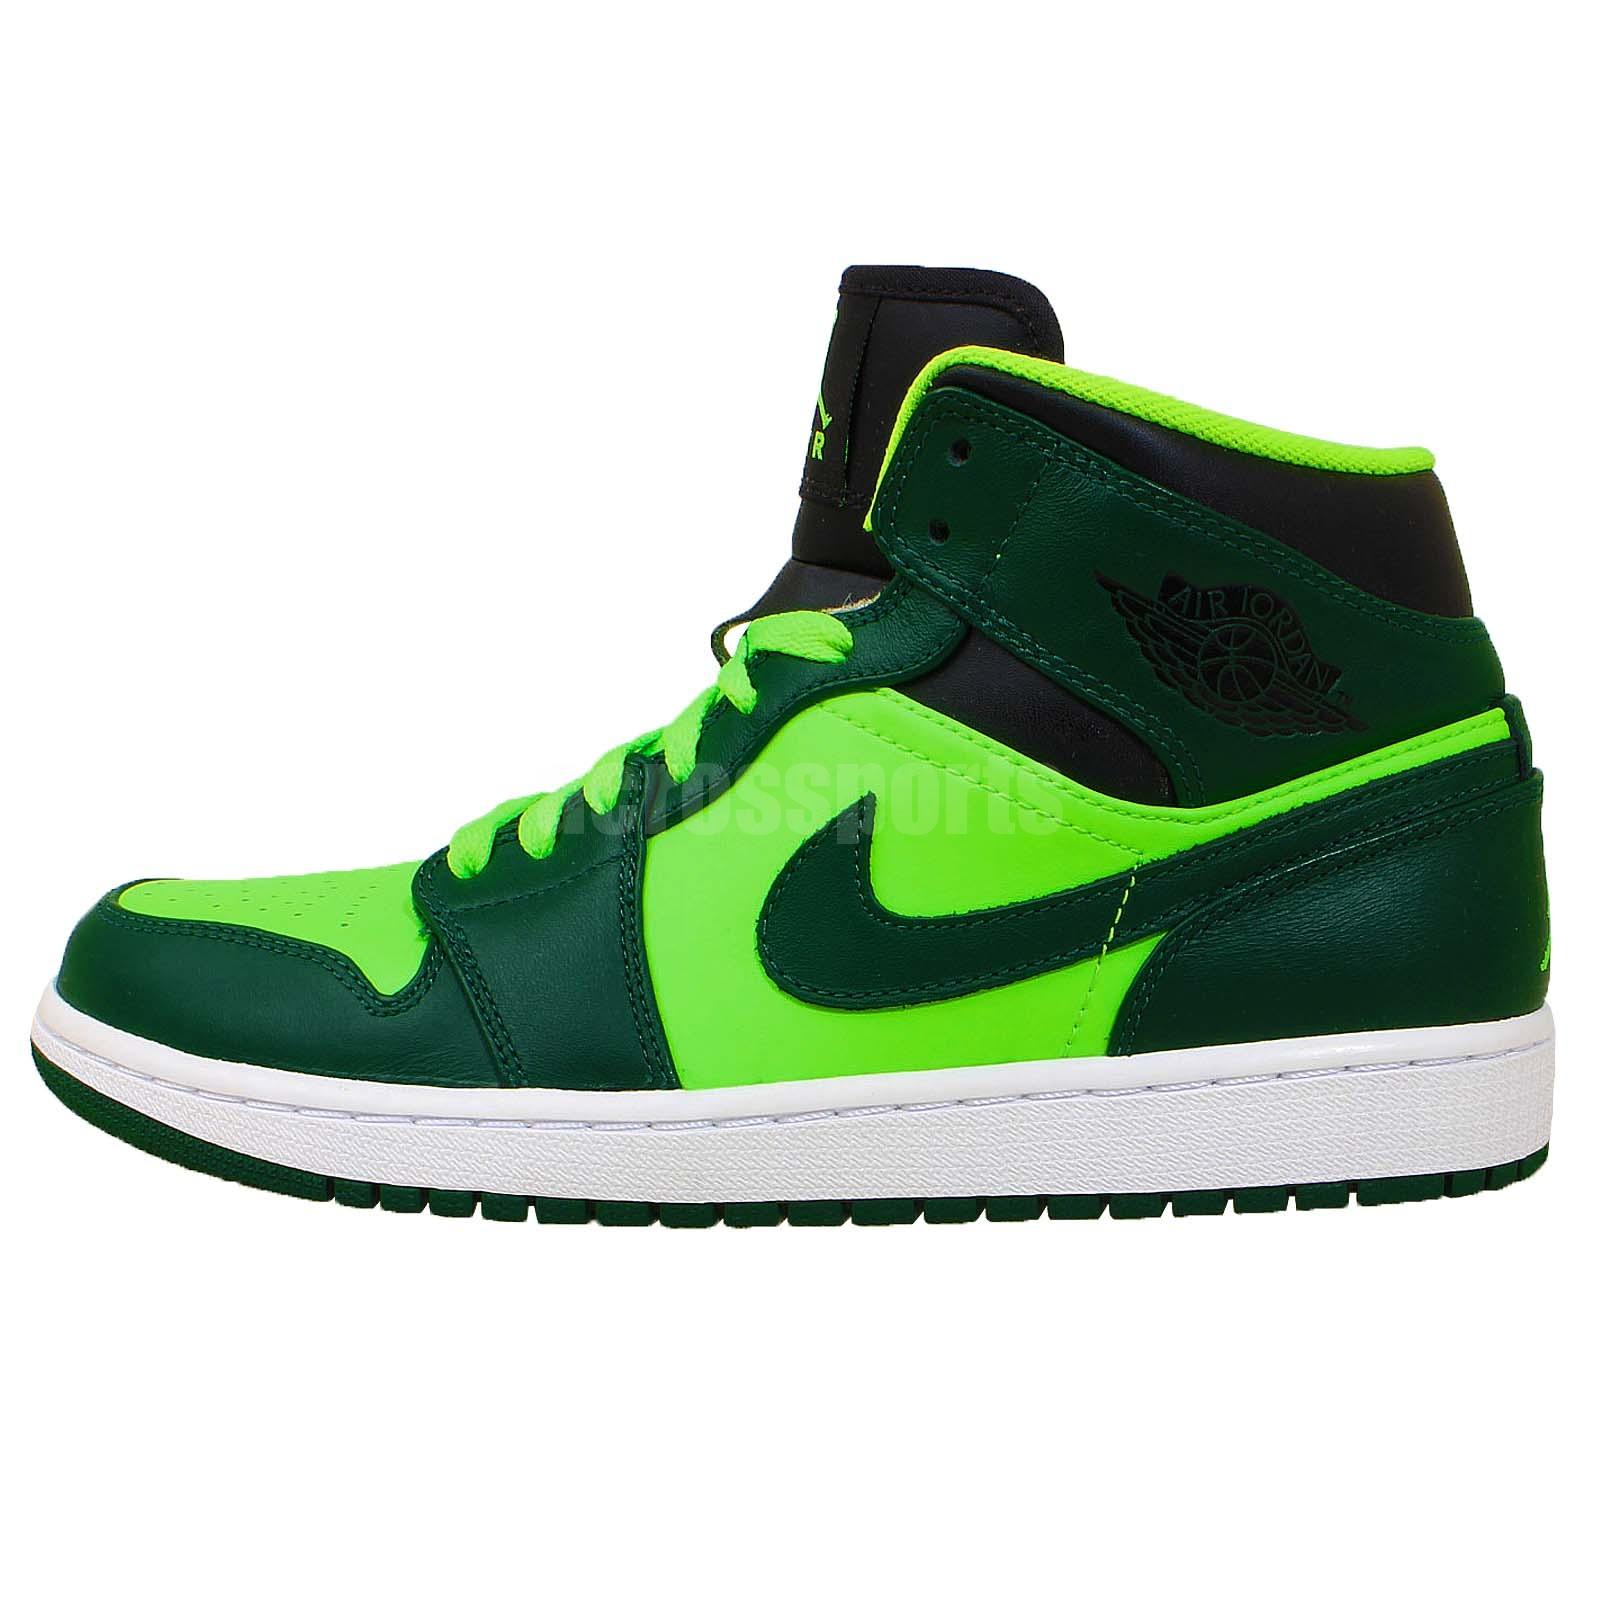 nike air jordan 1 mid aj1 green mens basketball shoes. Black Bedroom Furniture Sets. Home Design Ideas